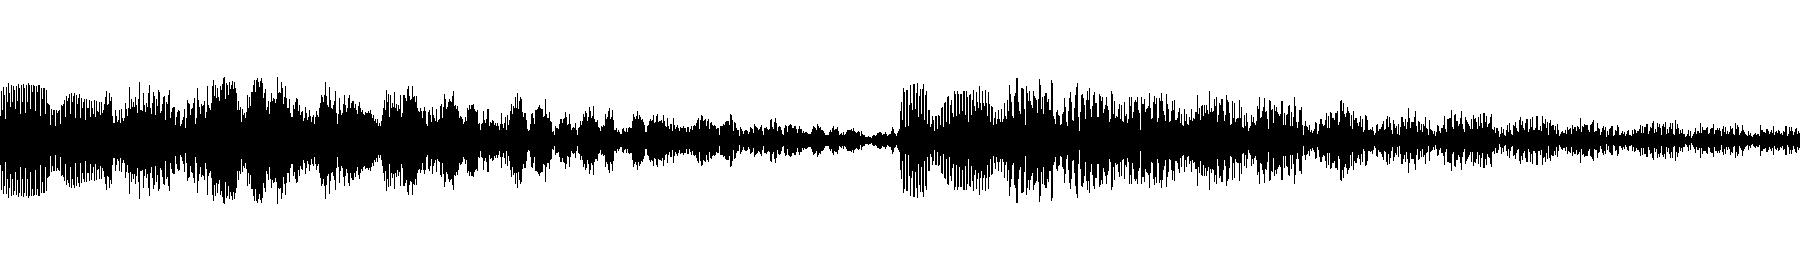 blbc dustygretsch 110 e